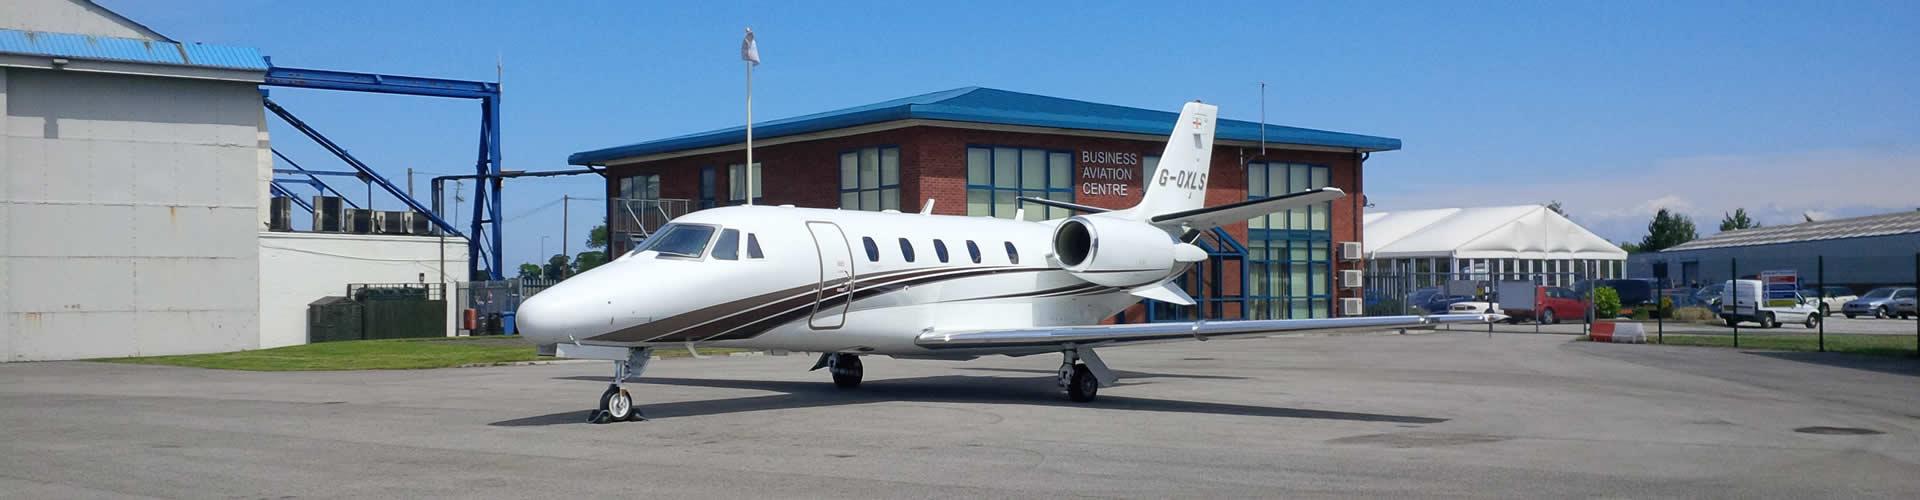 Cessna Citiation